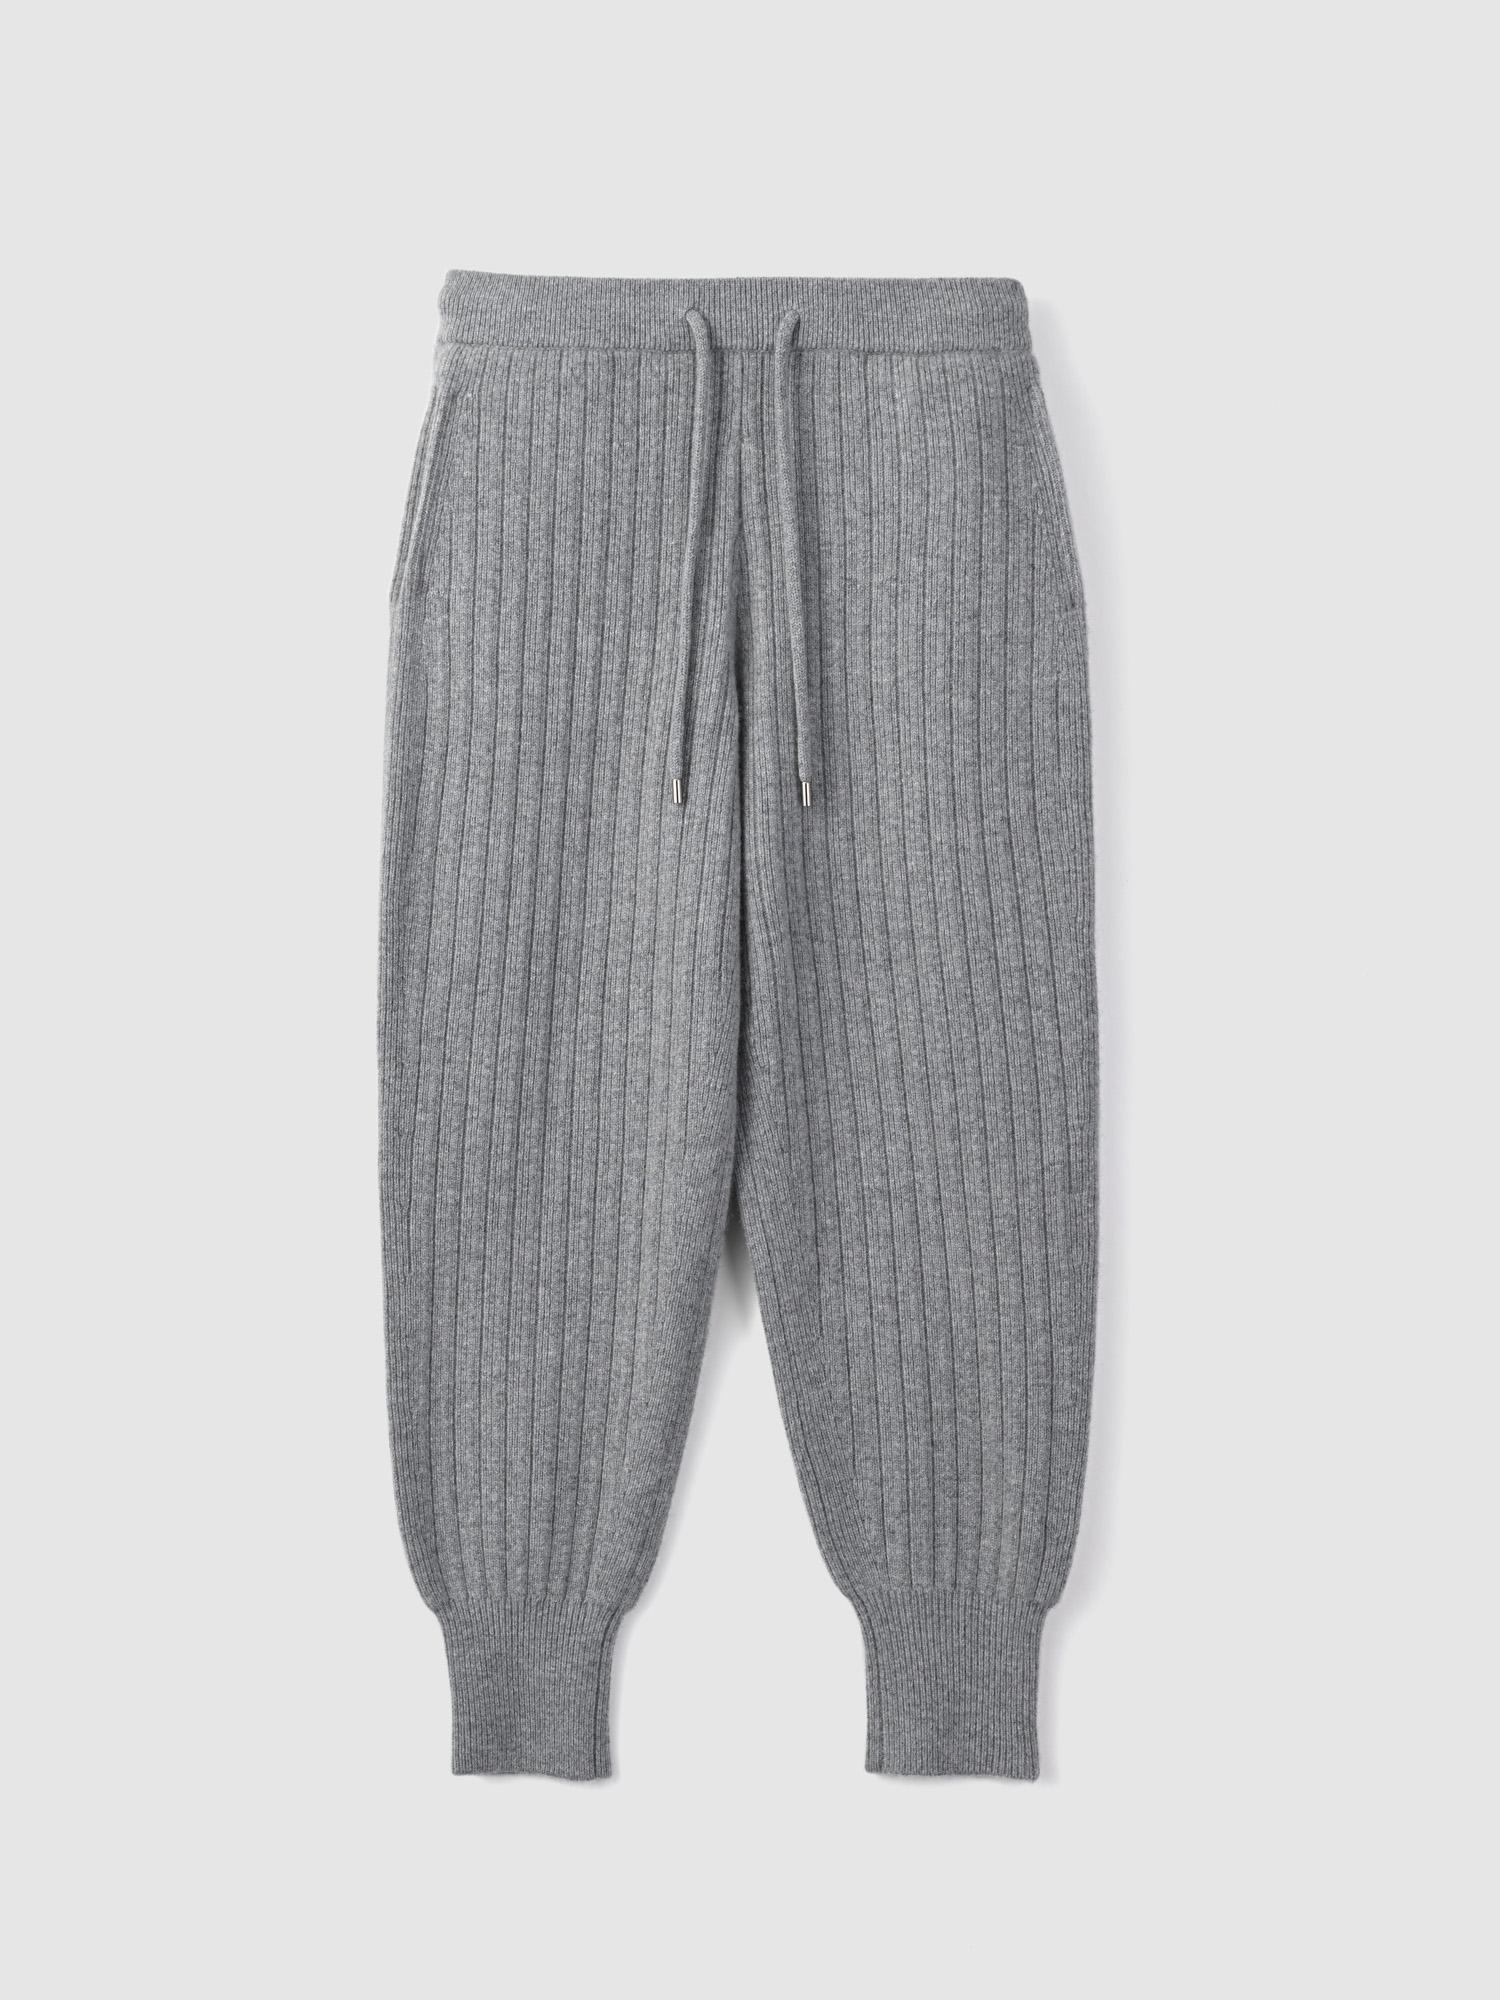 Accordion pants